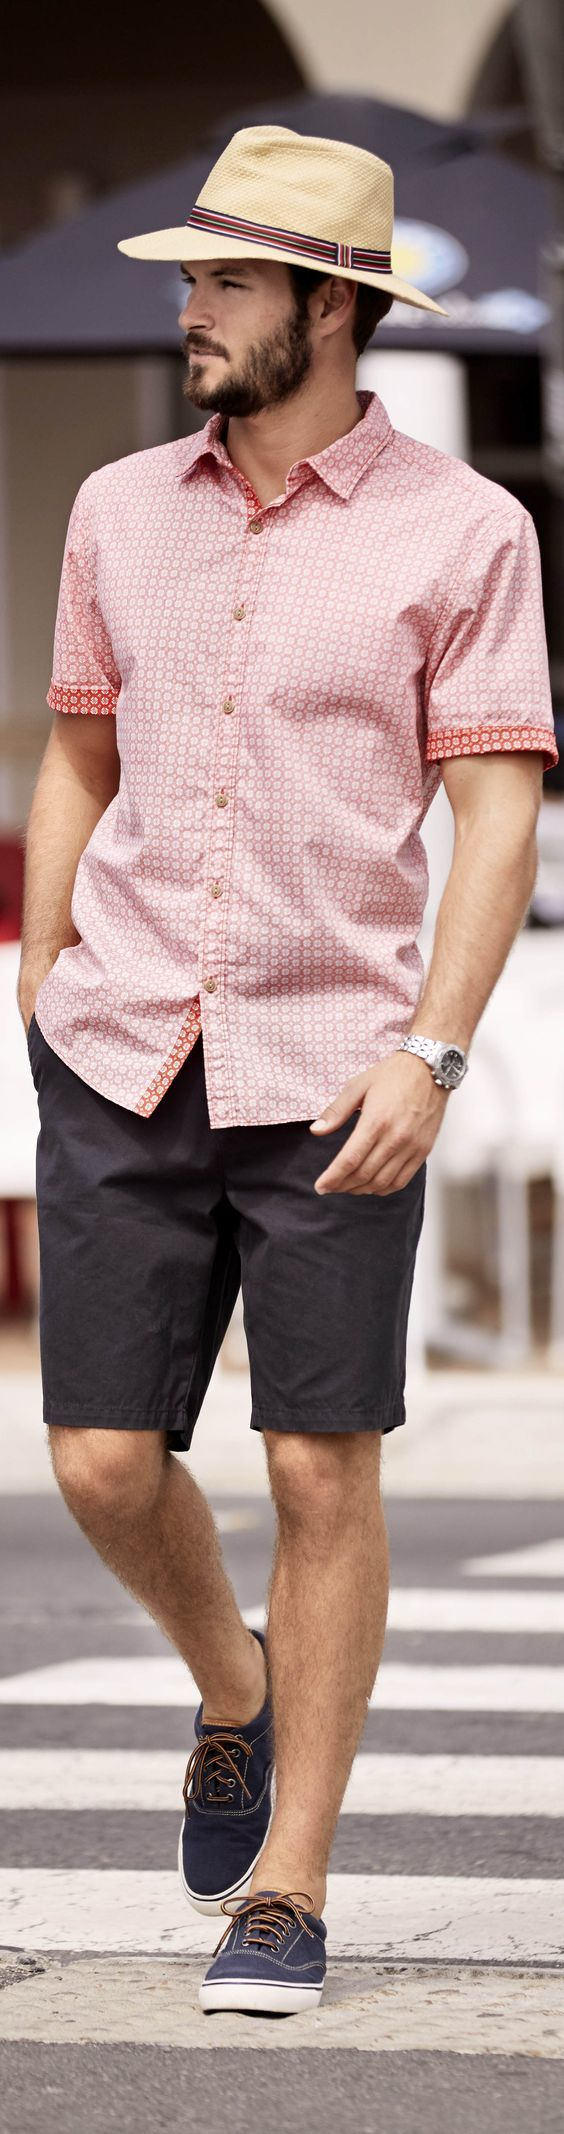 Men 39 s pink short sleeve shirt black shorts navy for Mens dark pink dress shirt